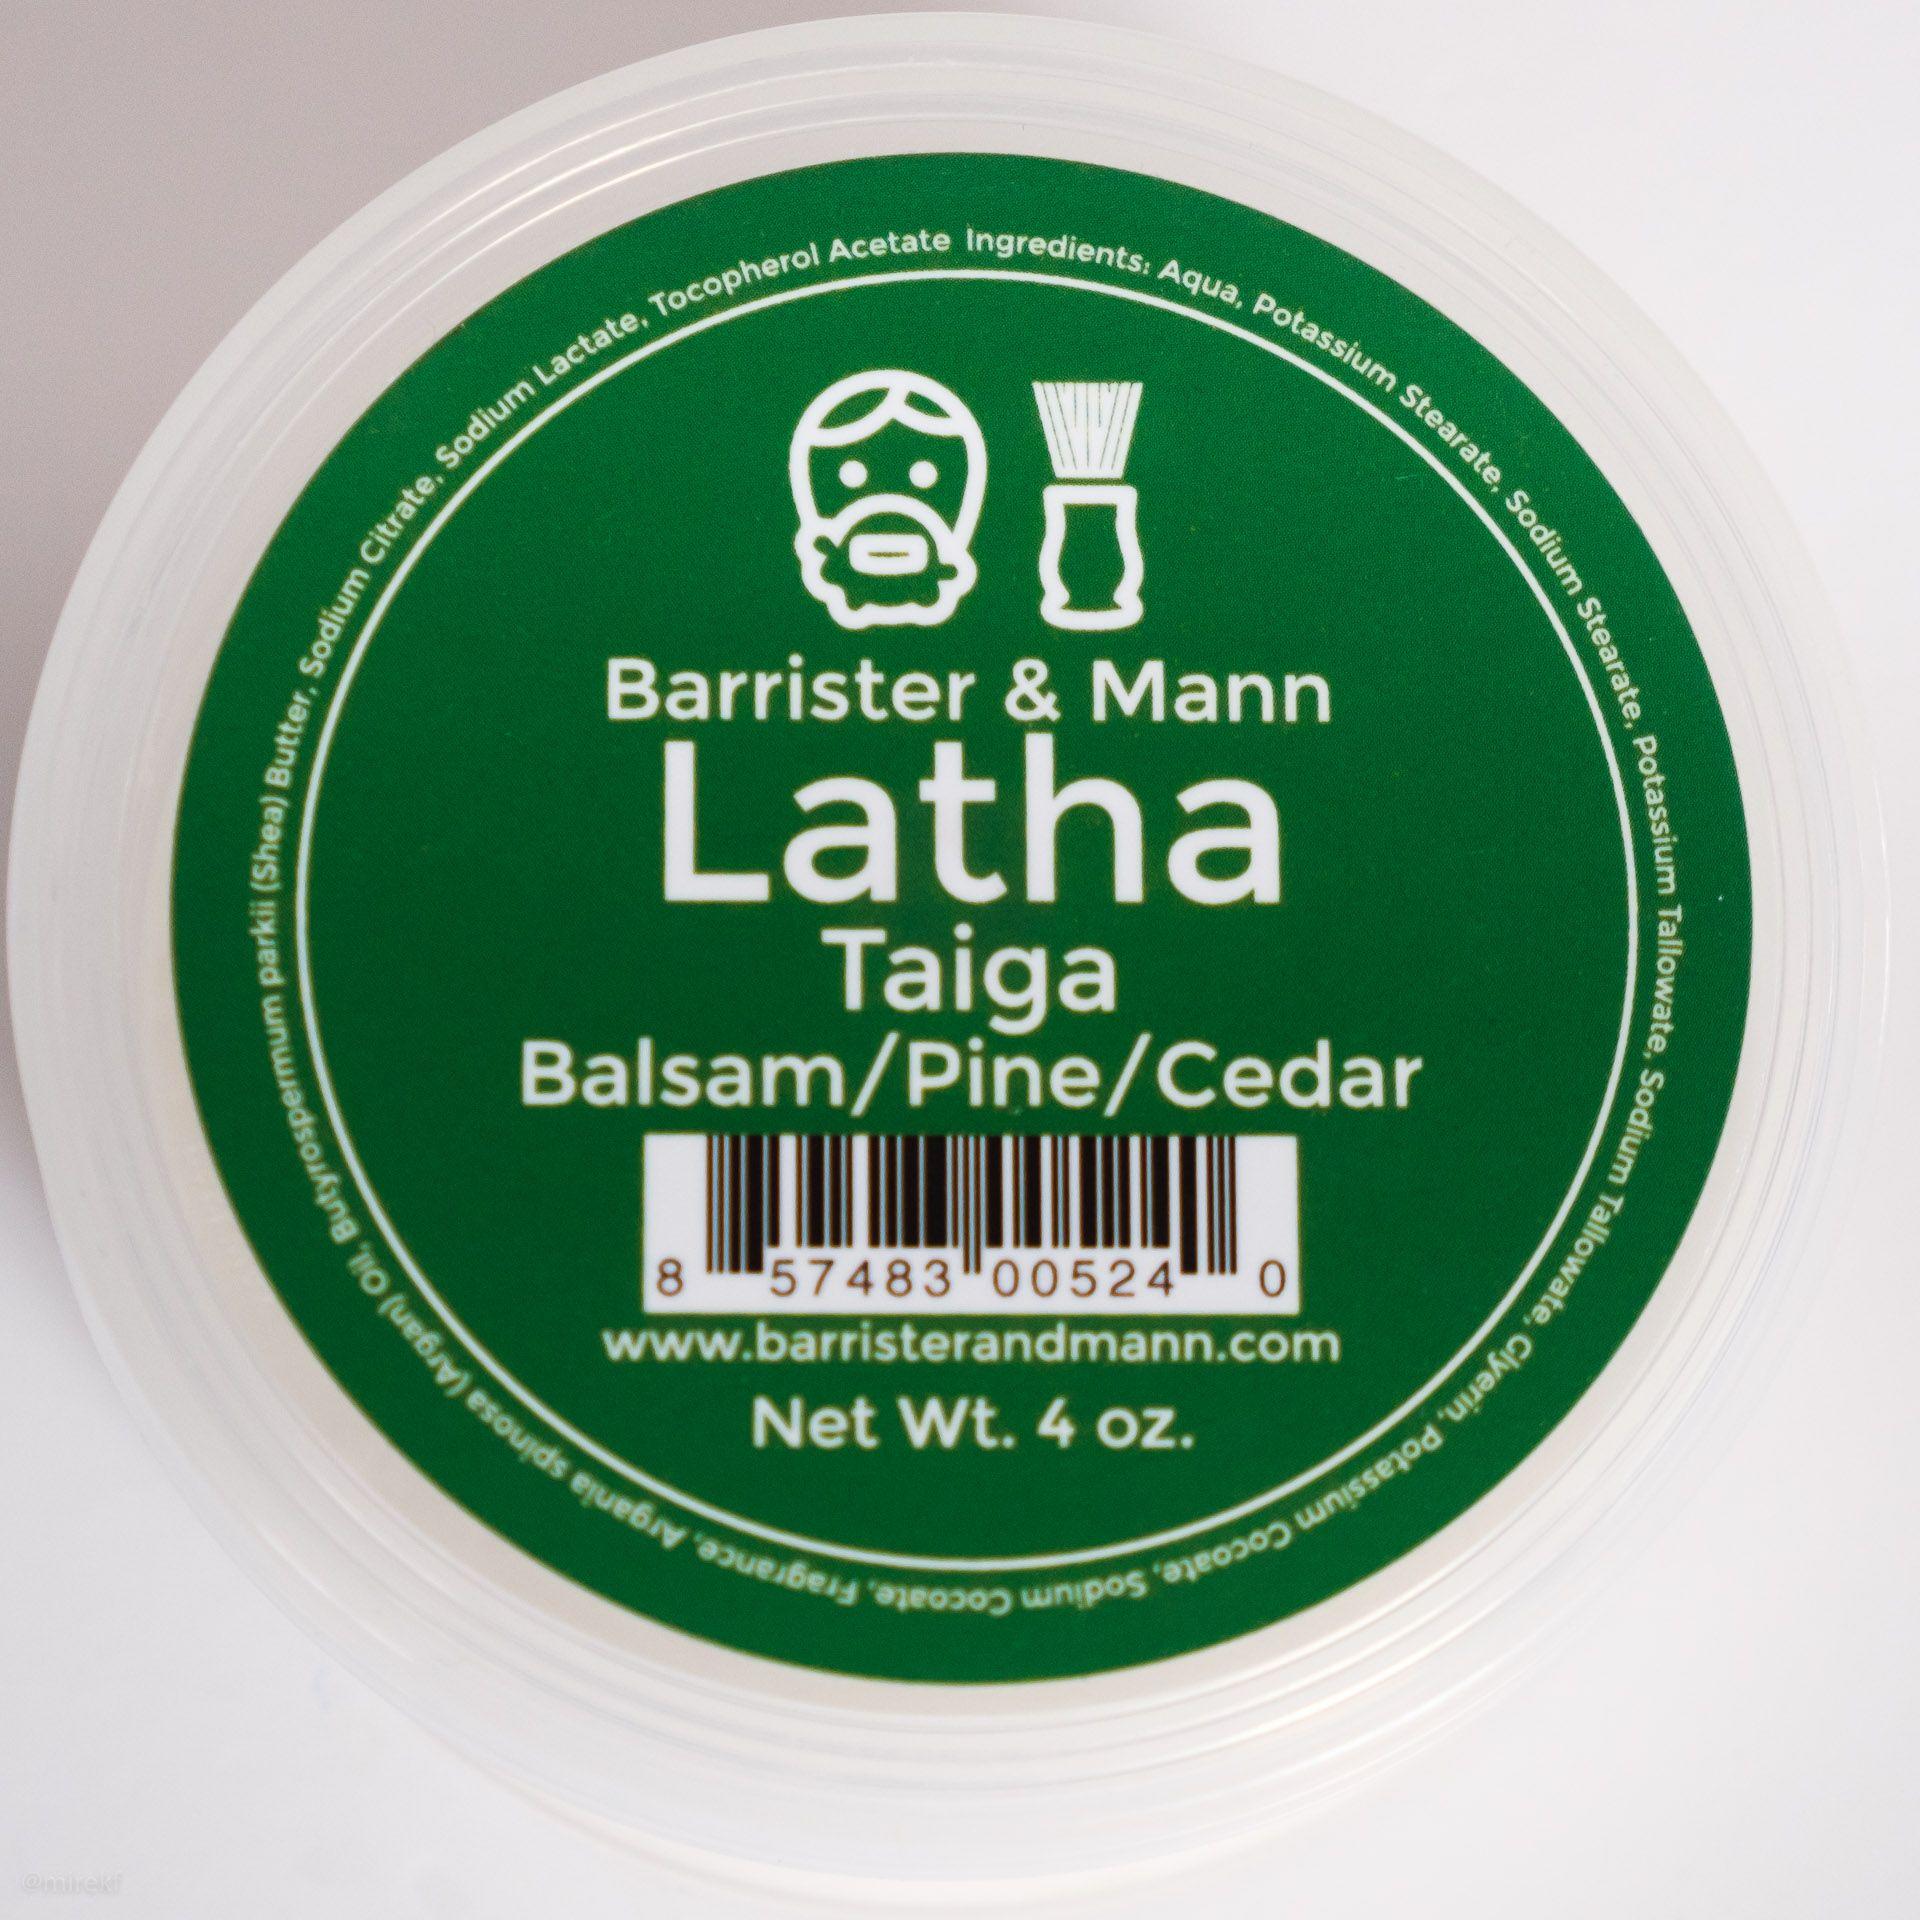 Skład mydła do golenia Barrister & Mann Latha Taiga Shaving Soap (INCI ingredients)